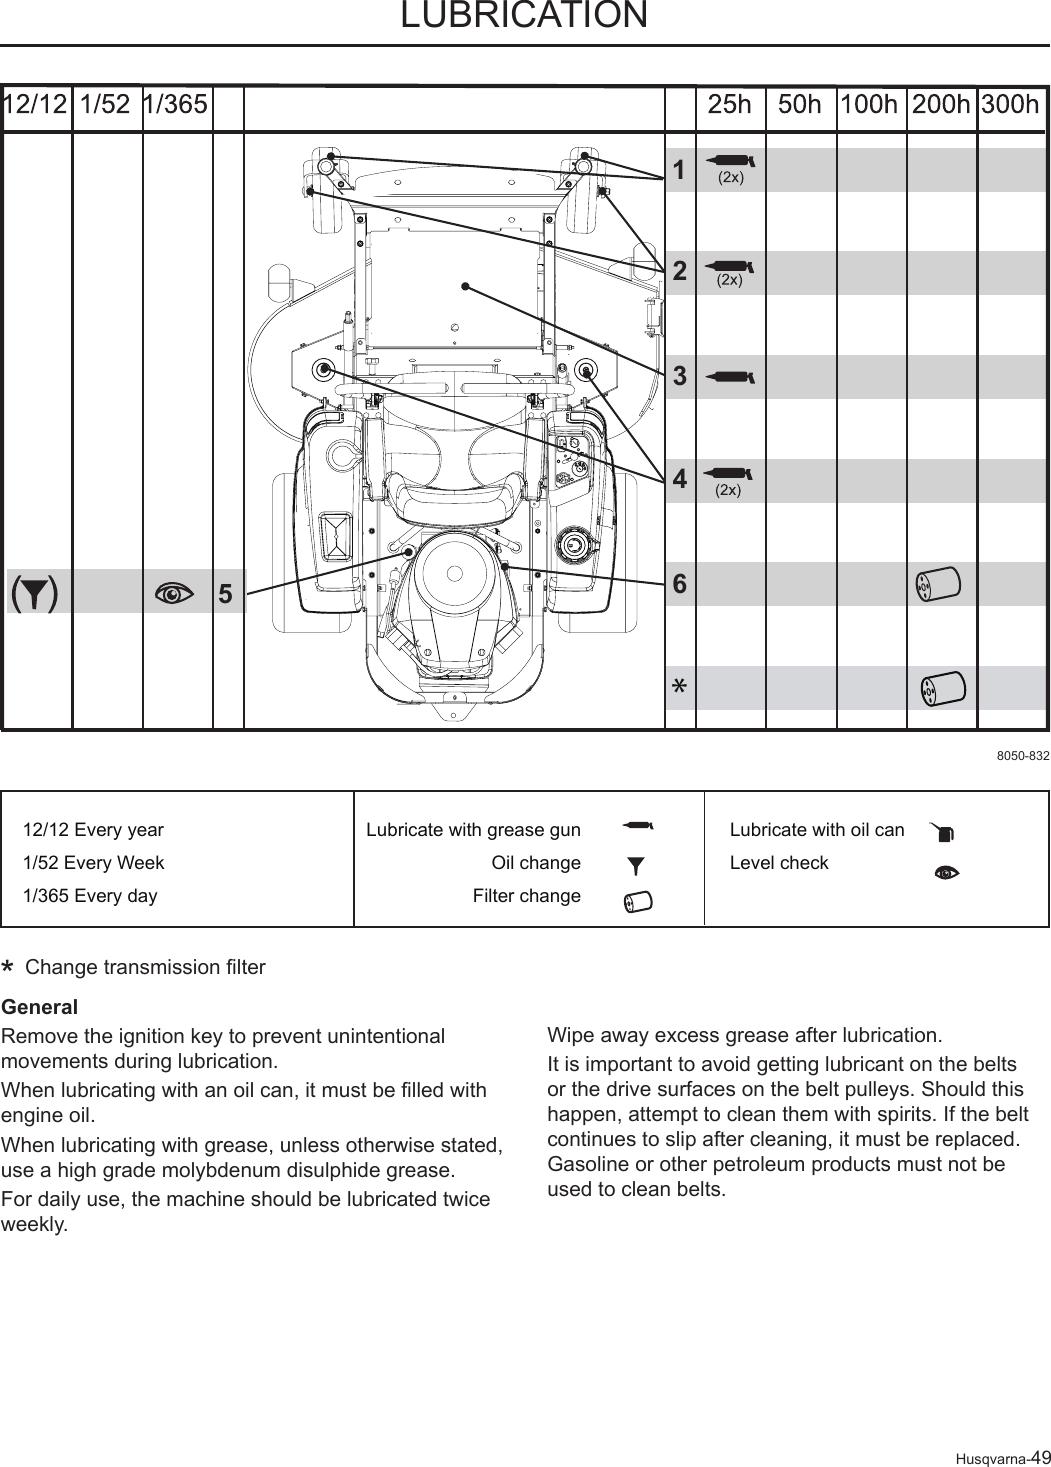 Husqvarna Ez4824 965880401 Users Manual OM, EZ ZERO TURN MOWER, EZC